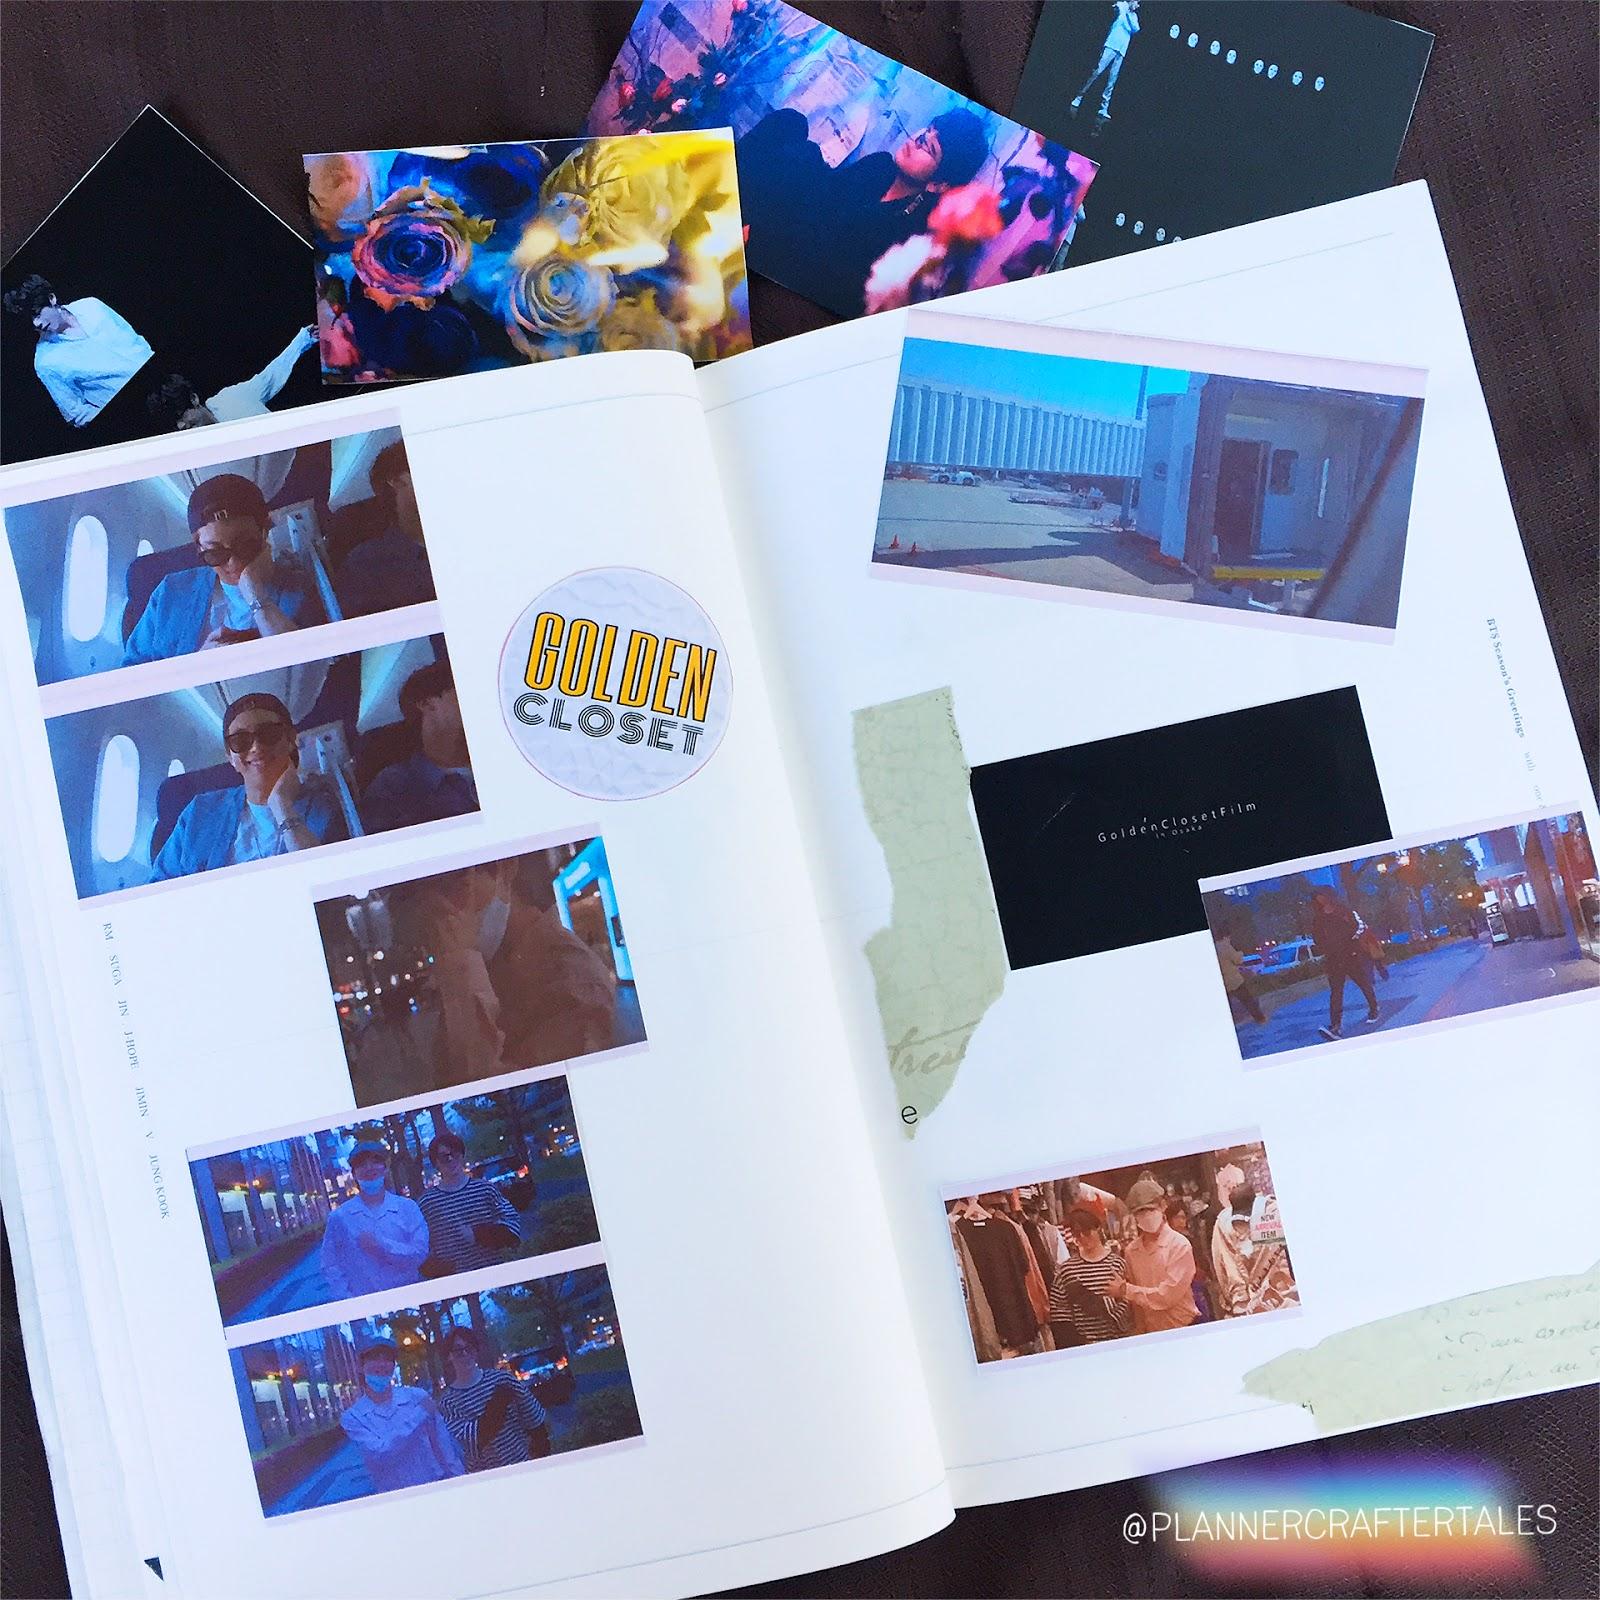 Journal With Me: Euphoria and Golden Closet Film Theme